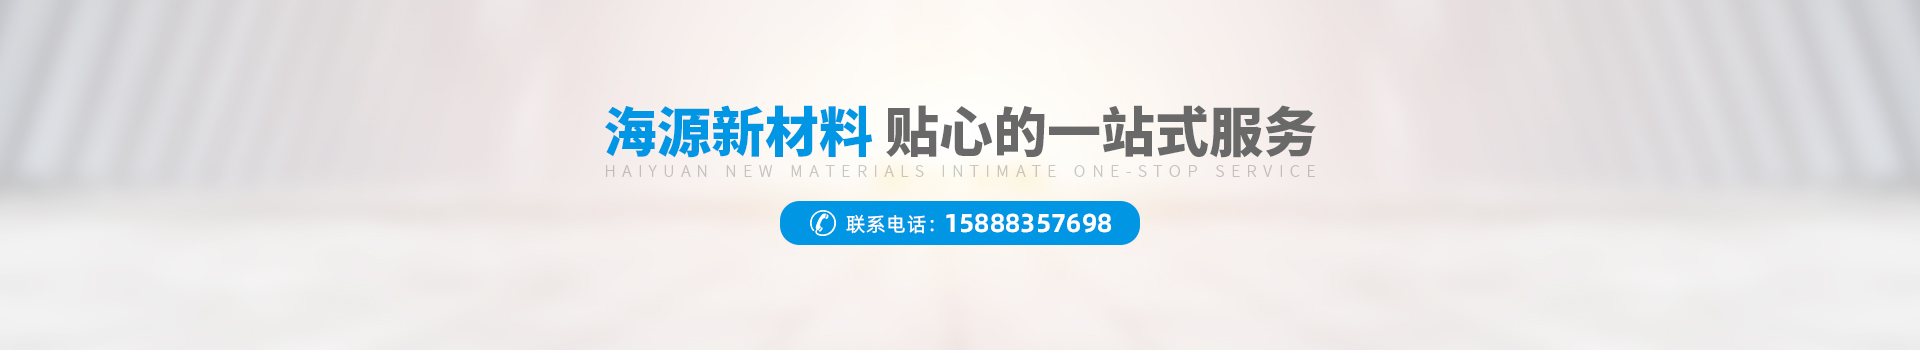 http://www.jxhaiyuan.com/data/upload/201911/20191105165838_350.jpg